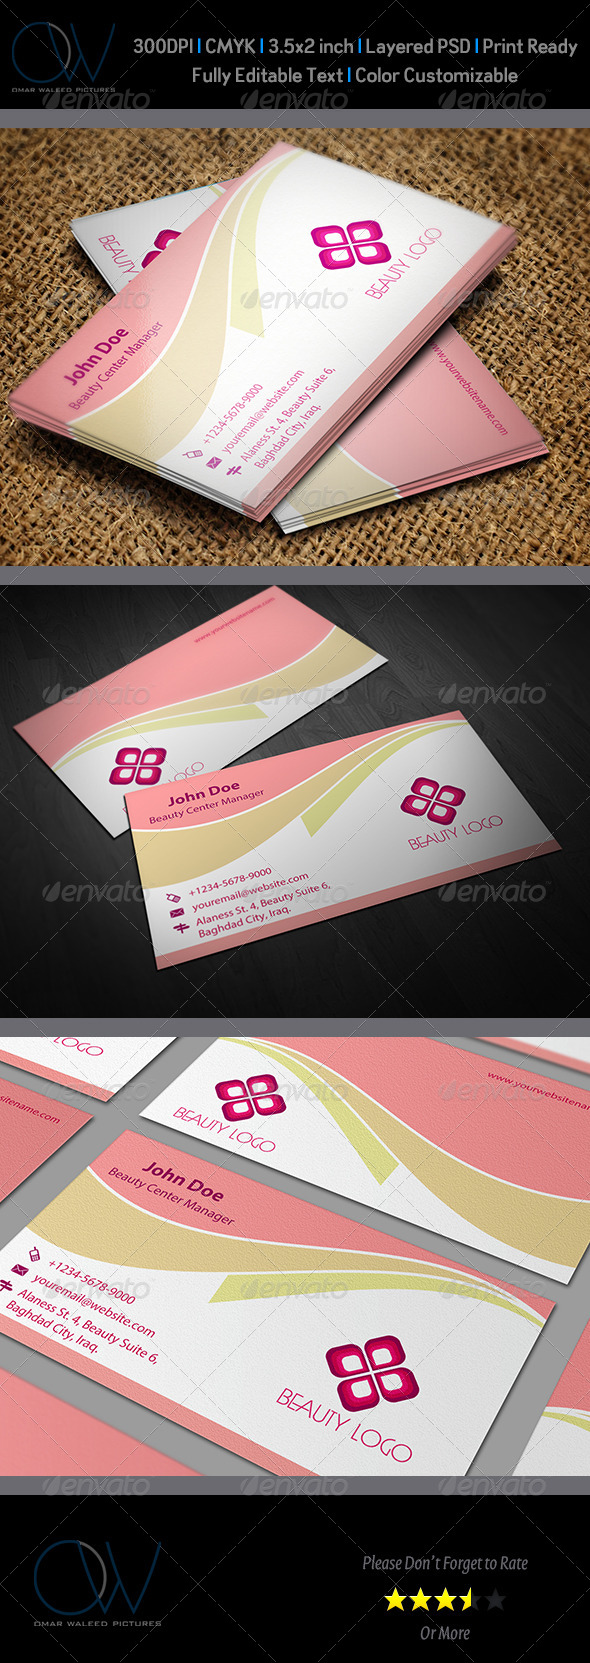 Beauty Salon Business Card Template Vol.1 - Corporate Business Cards